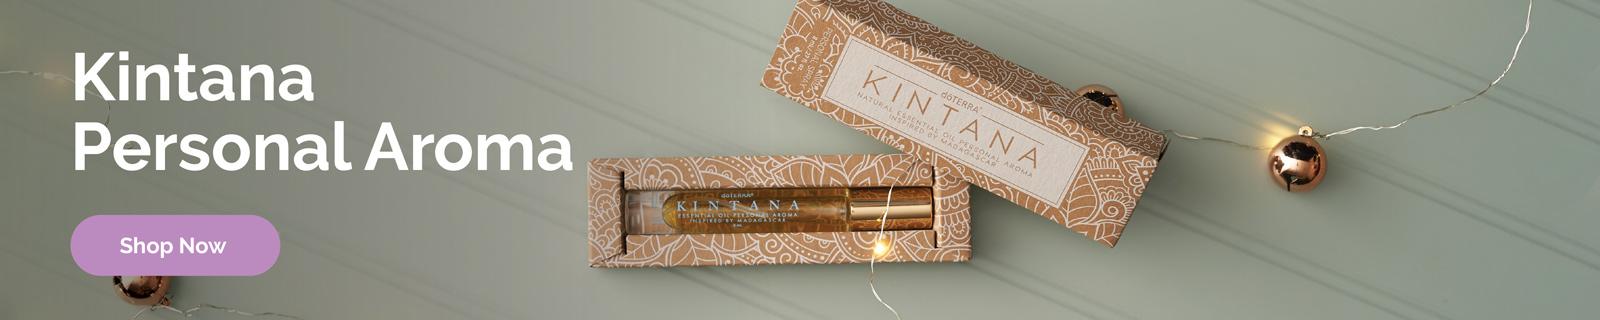 Check out the Kintana Personal Aroma here.